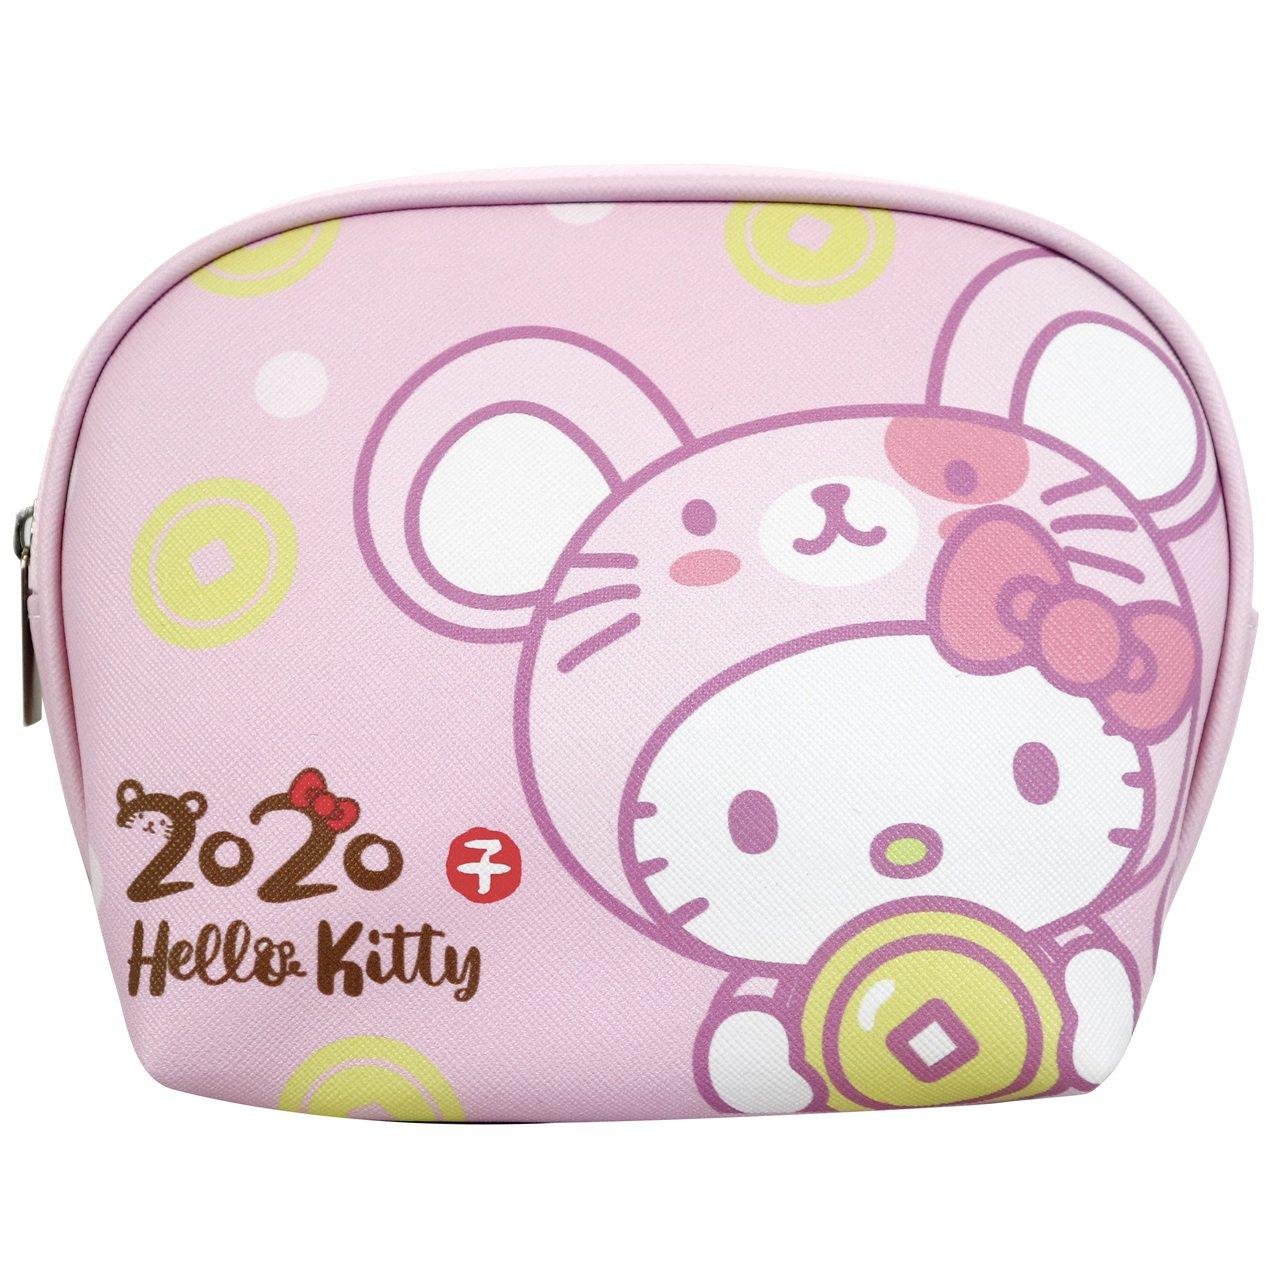 7-ELEVEN「Hello Kitty金鼠年限定萬用包」粉色款正面。圖/7-E...